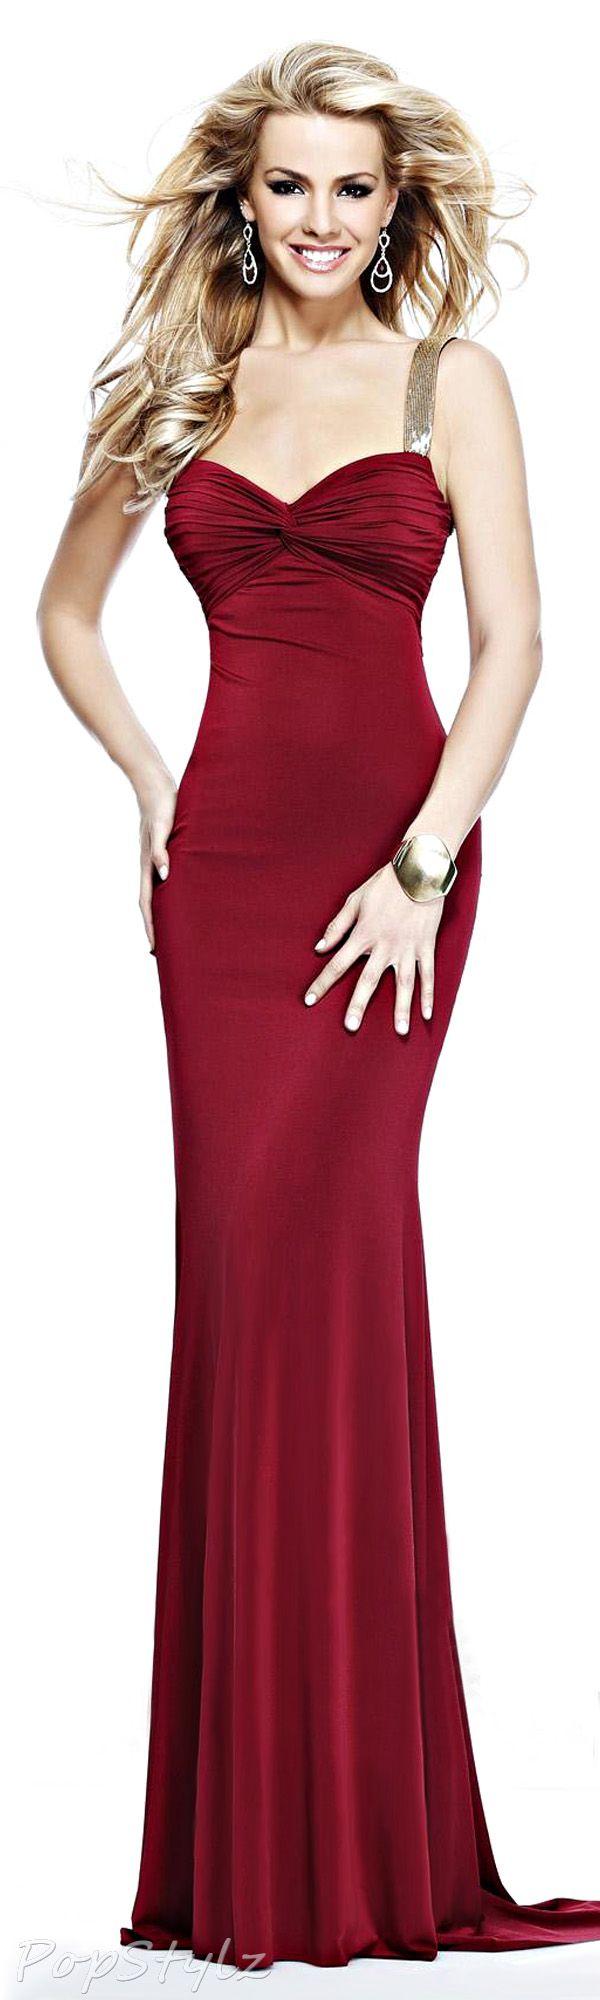 Tarik Ediz 2014 Evening Gown | likk | Pinterest | Gowns, Red evening ...